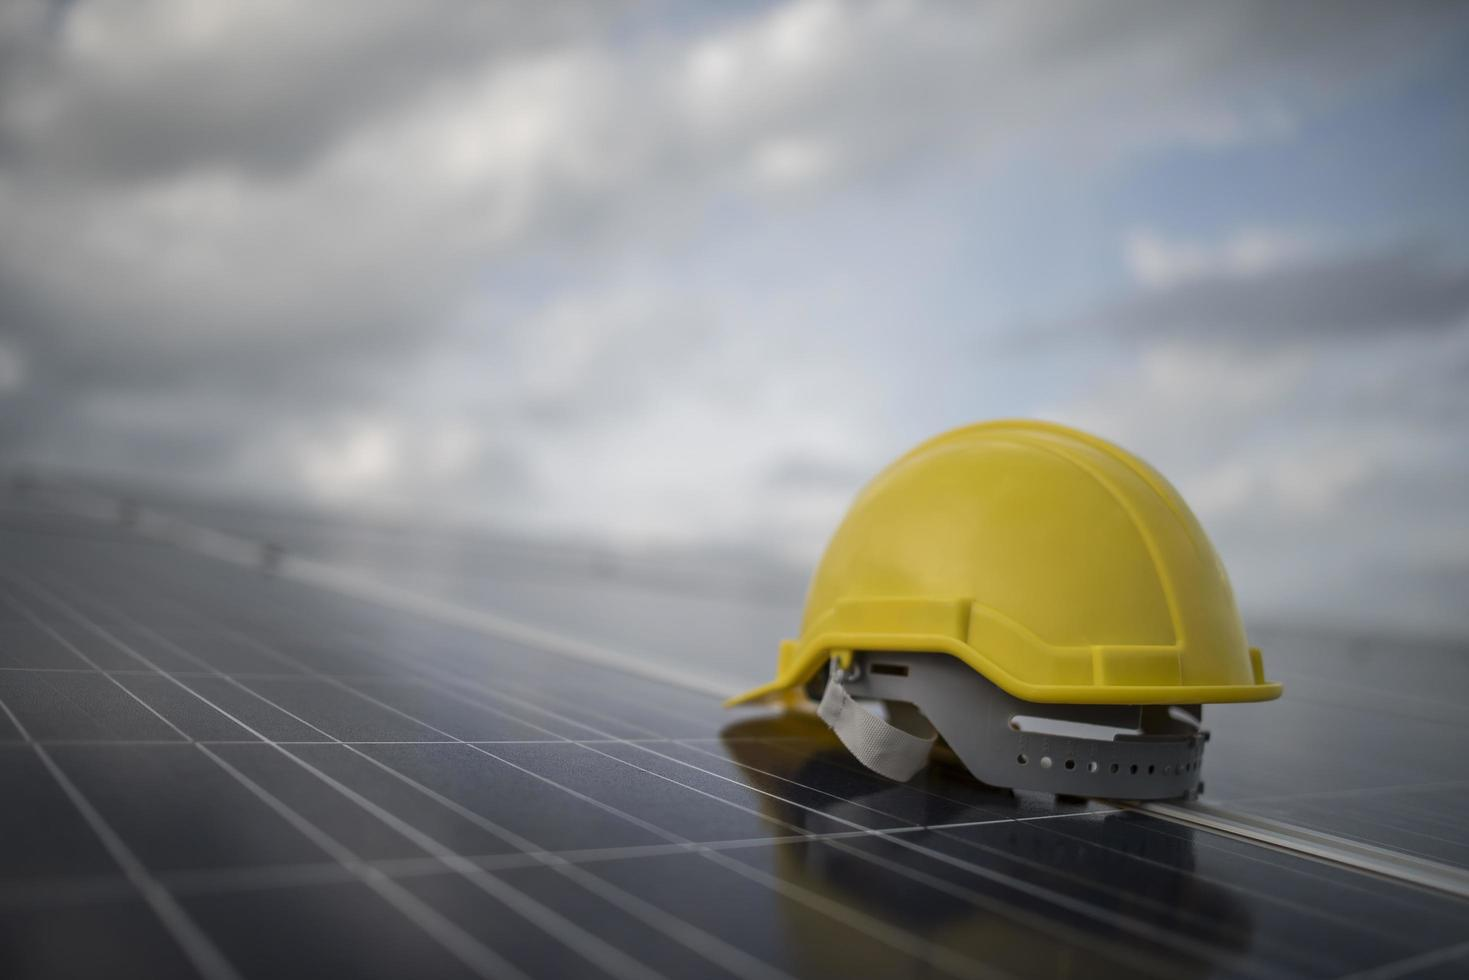 Yellow safety helmet on solar panel photo